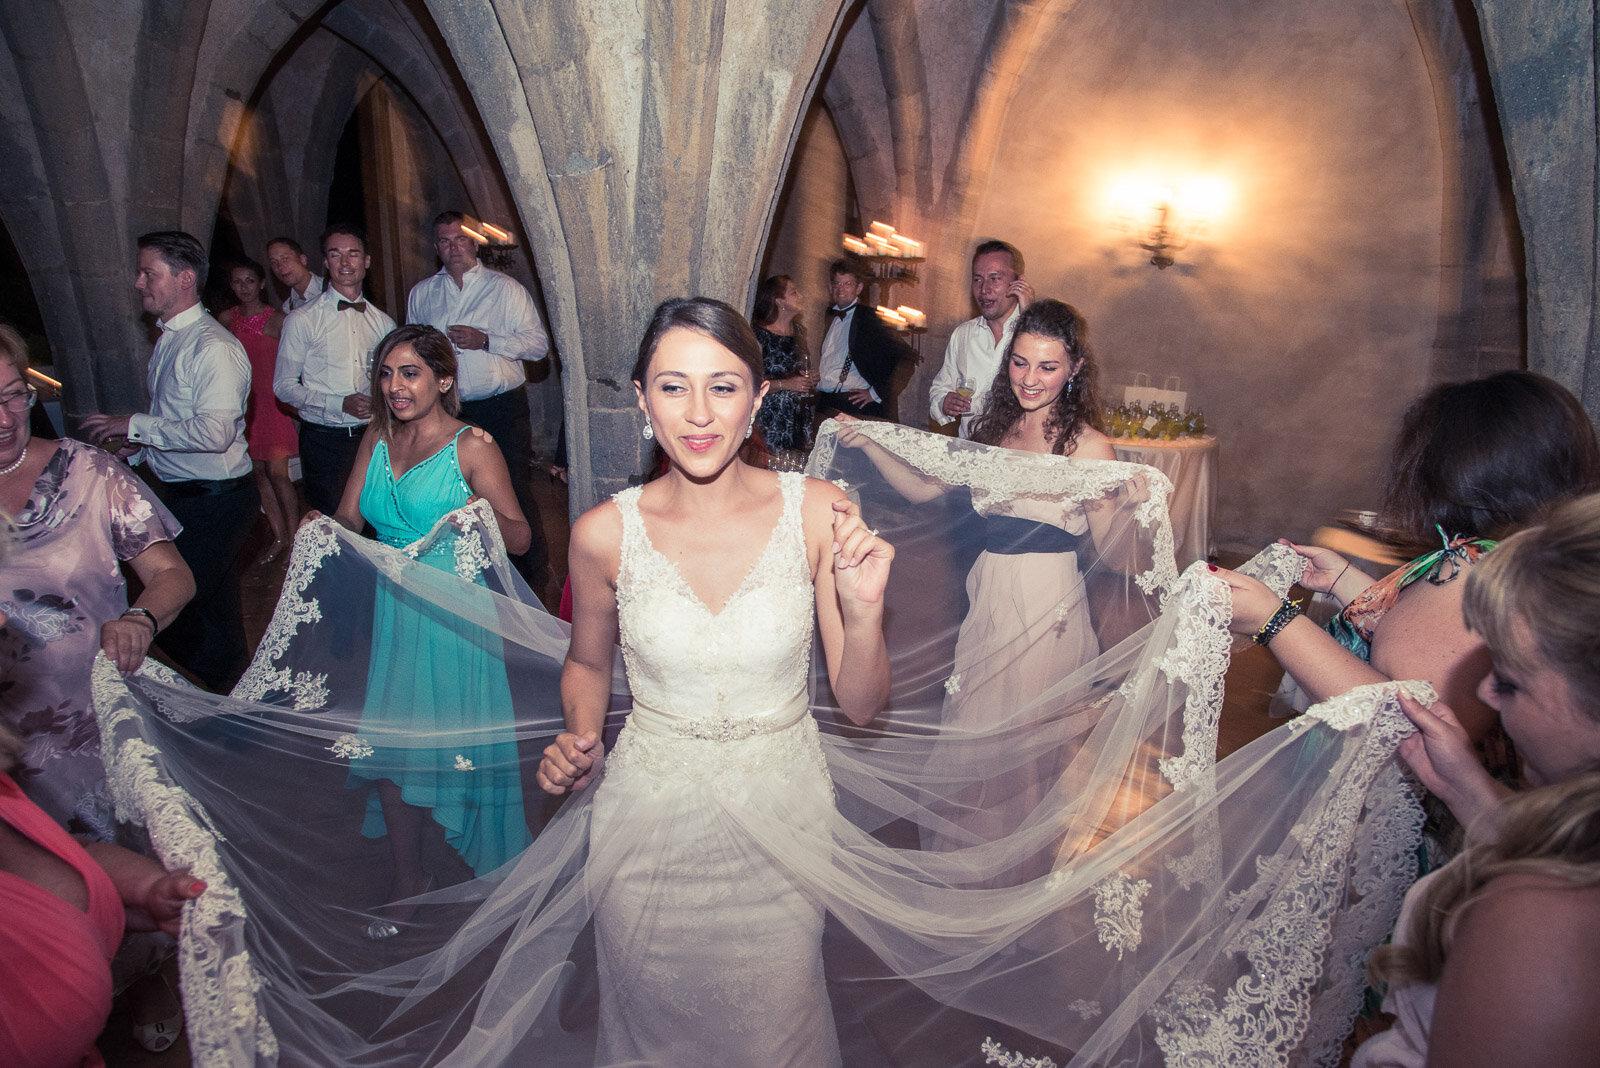 Russian Wedding in Villa Cimbrone Costiera Amalfitana 33.jpg